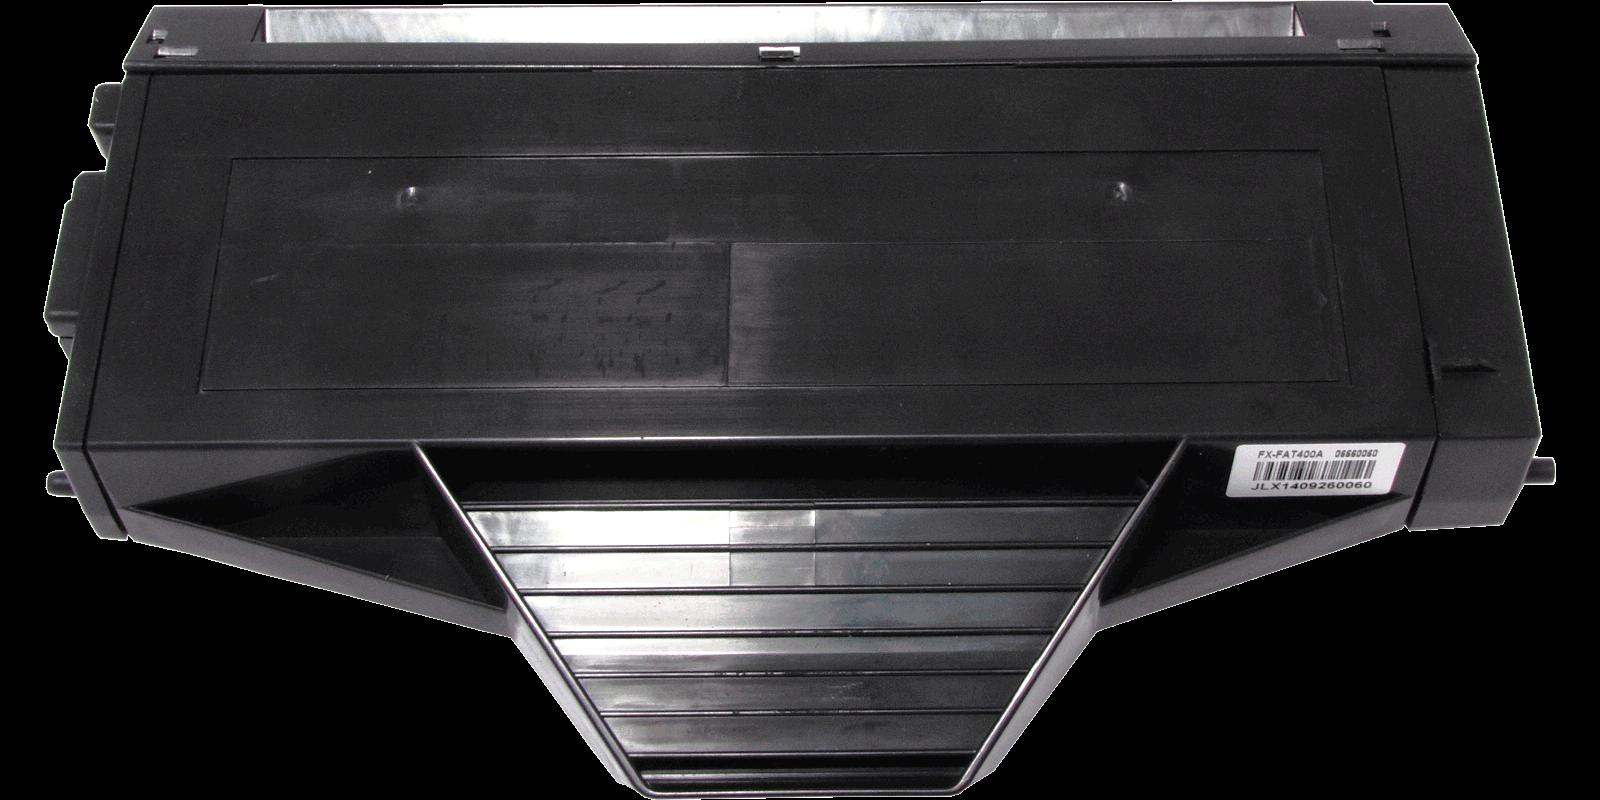 MAK KX-FAT400A, черный, для Panasonic, до 1800 стр.